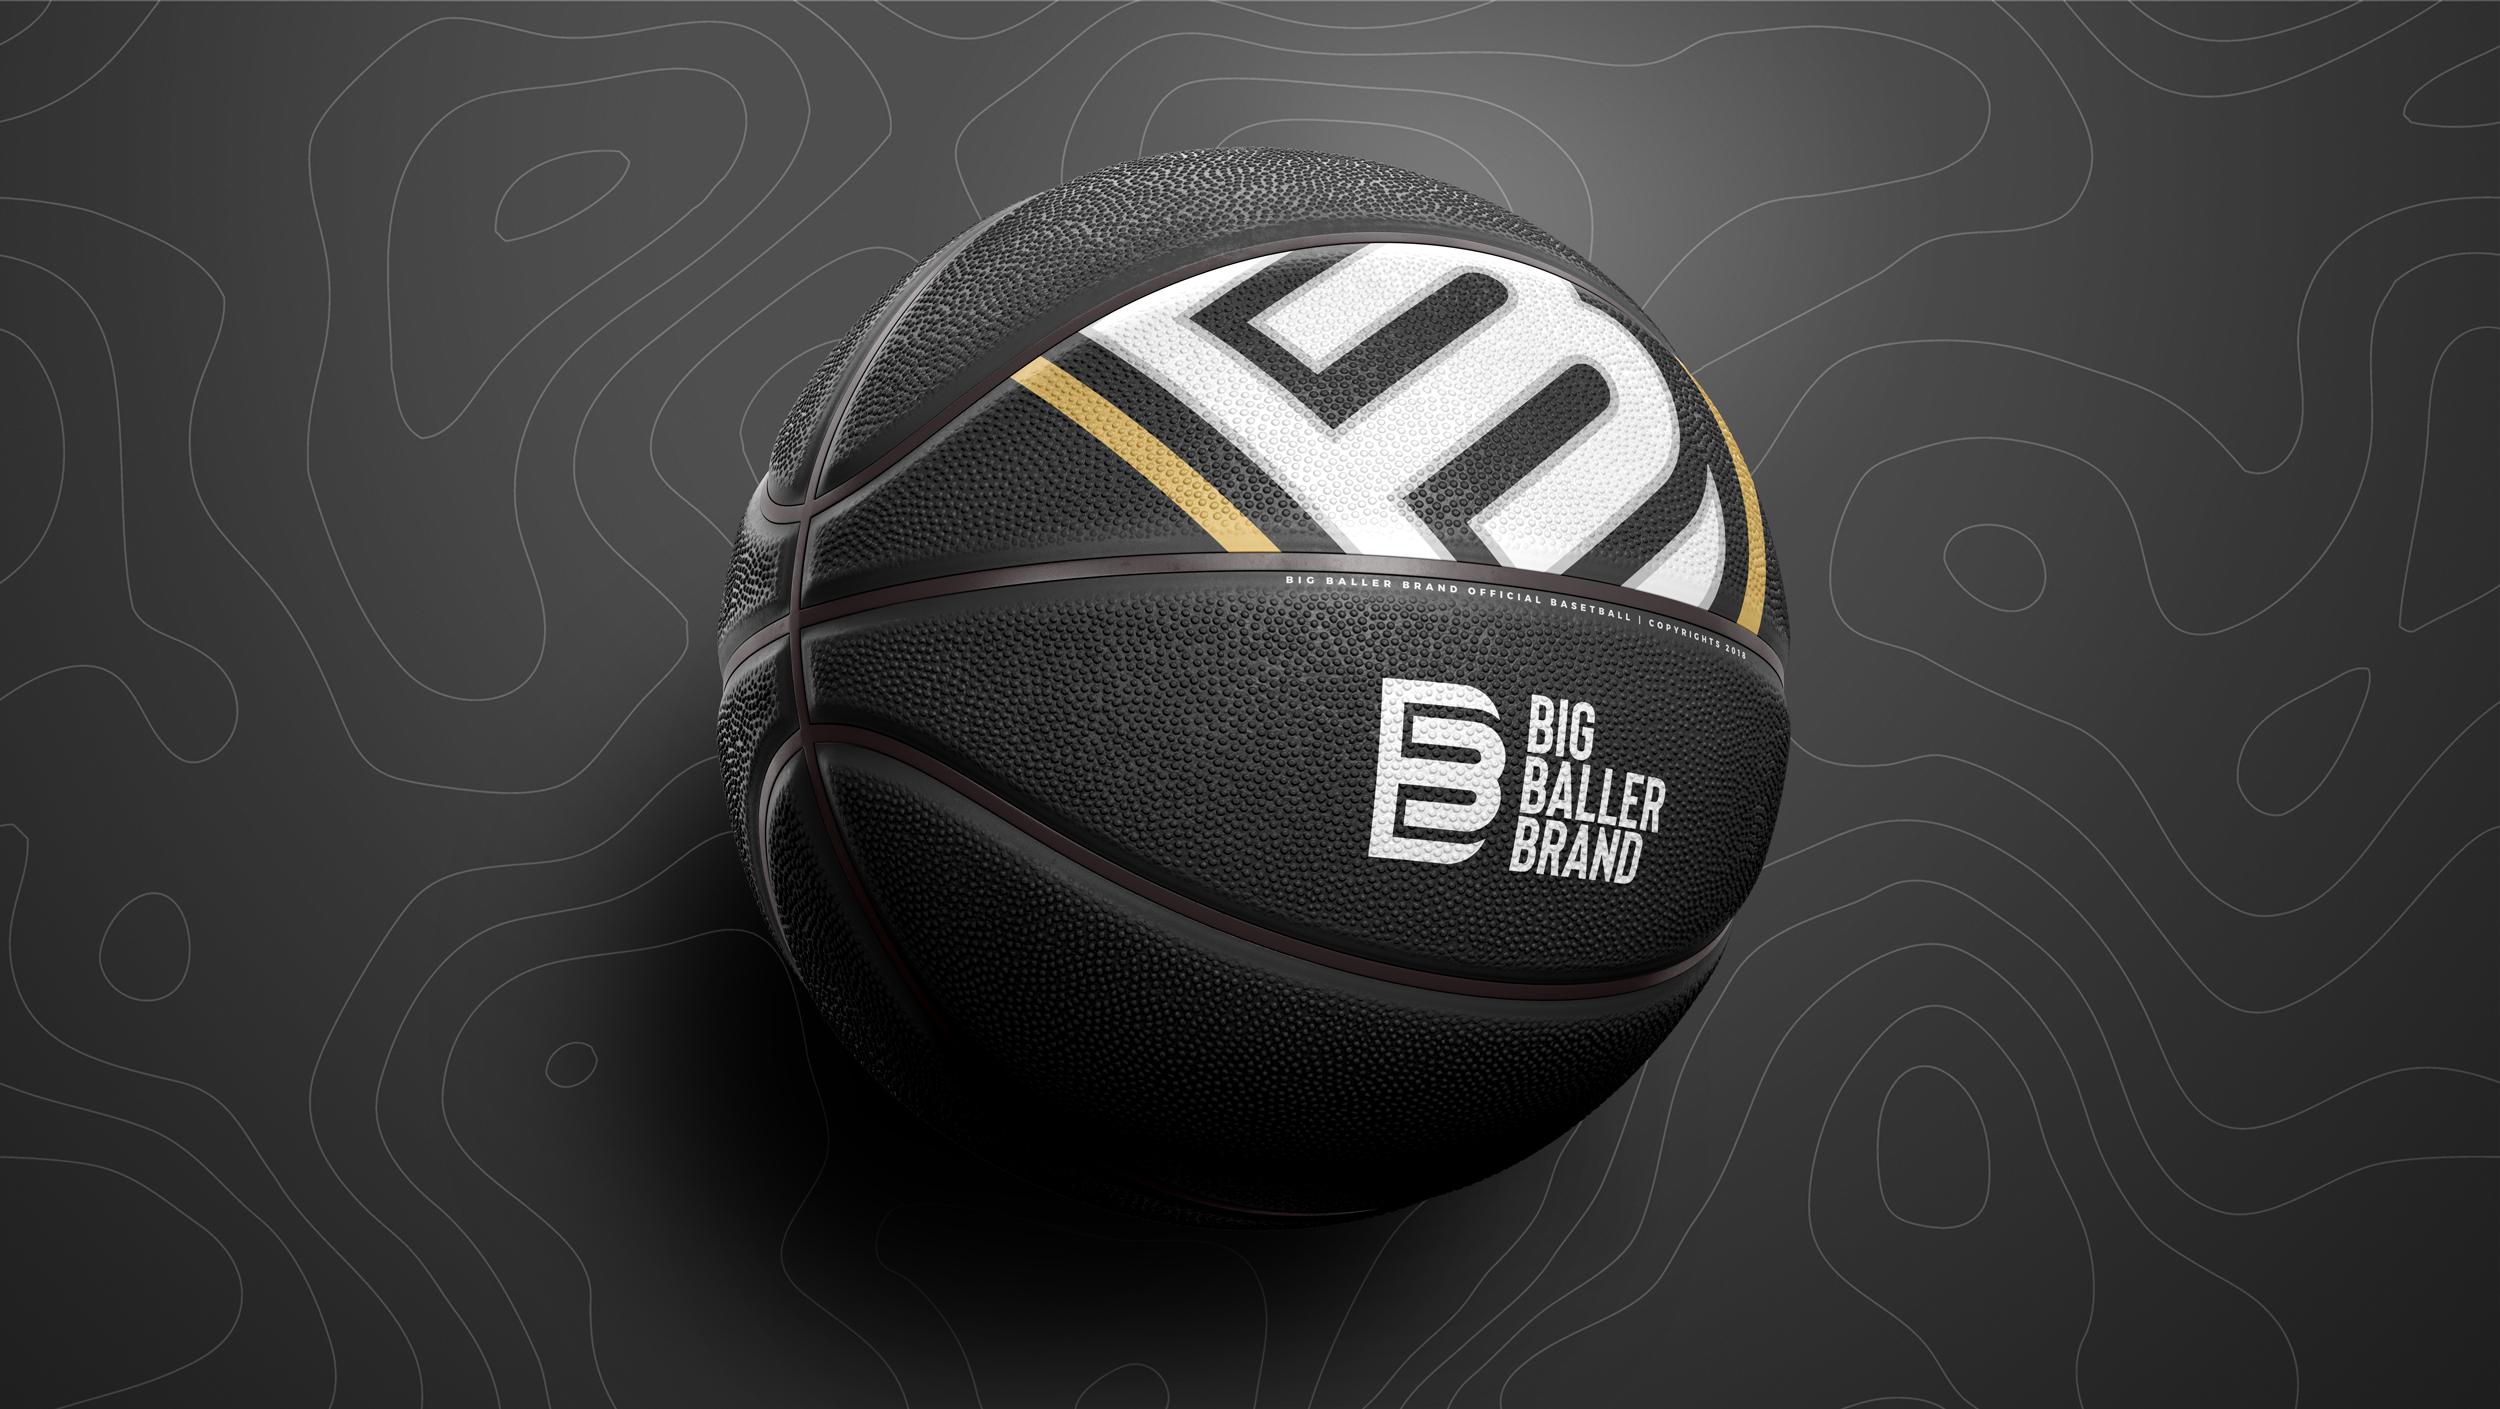 Big-Baller-Brand_Basketball.jpg